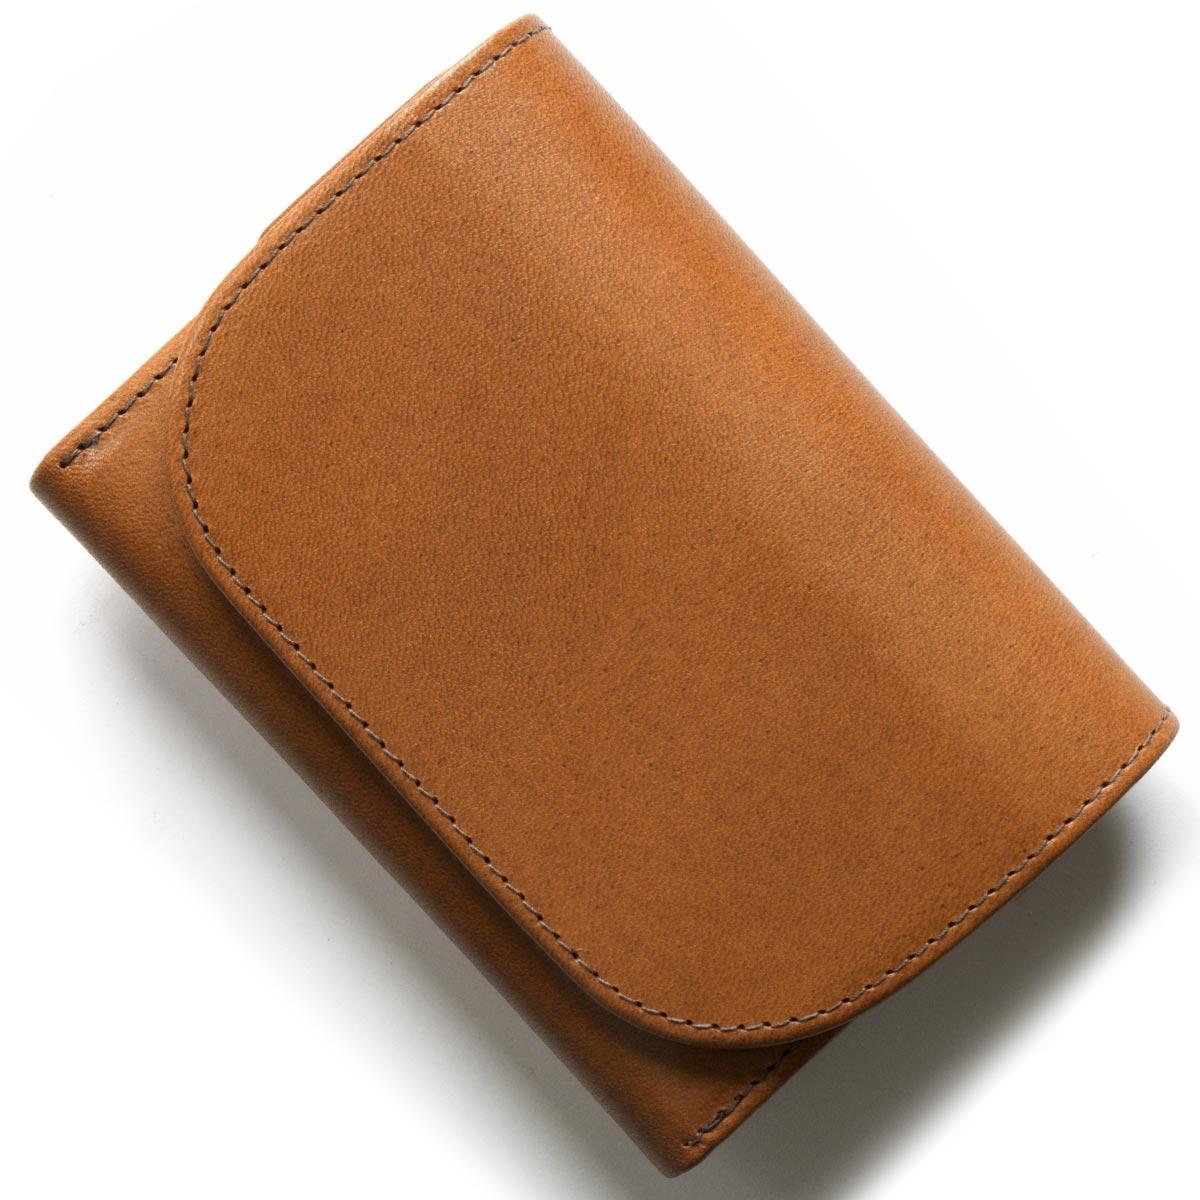 brand new 9525c e2c6d ホワイトハウスコックス コインケース【小銭入れ】/ミニ財布 財布 メンズ コニャックブラウン S1884 COGNAC WHITEHOUSE COX